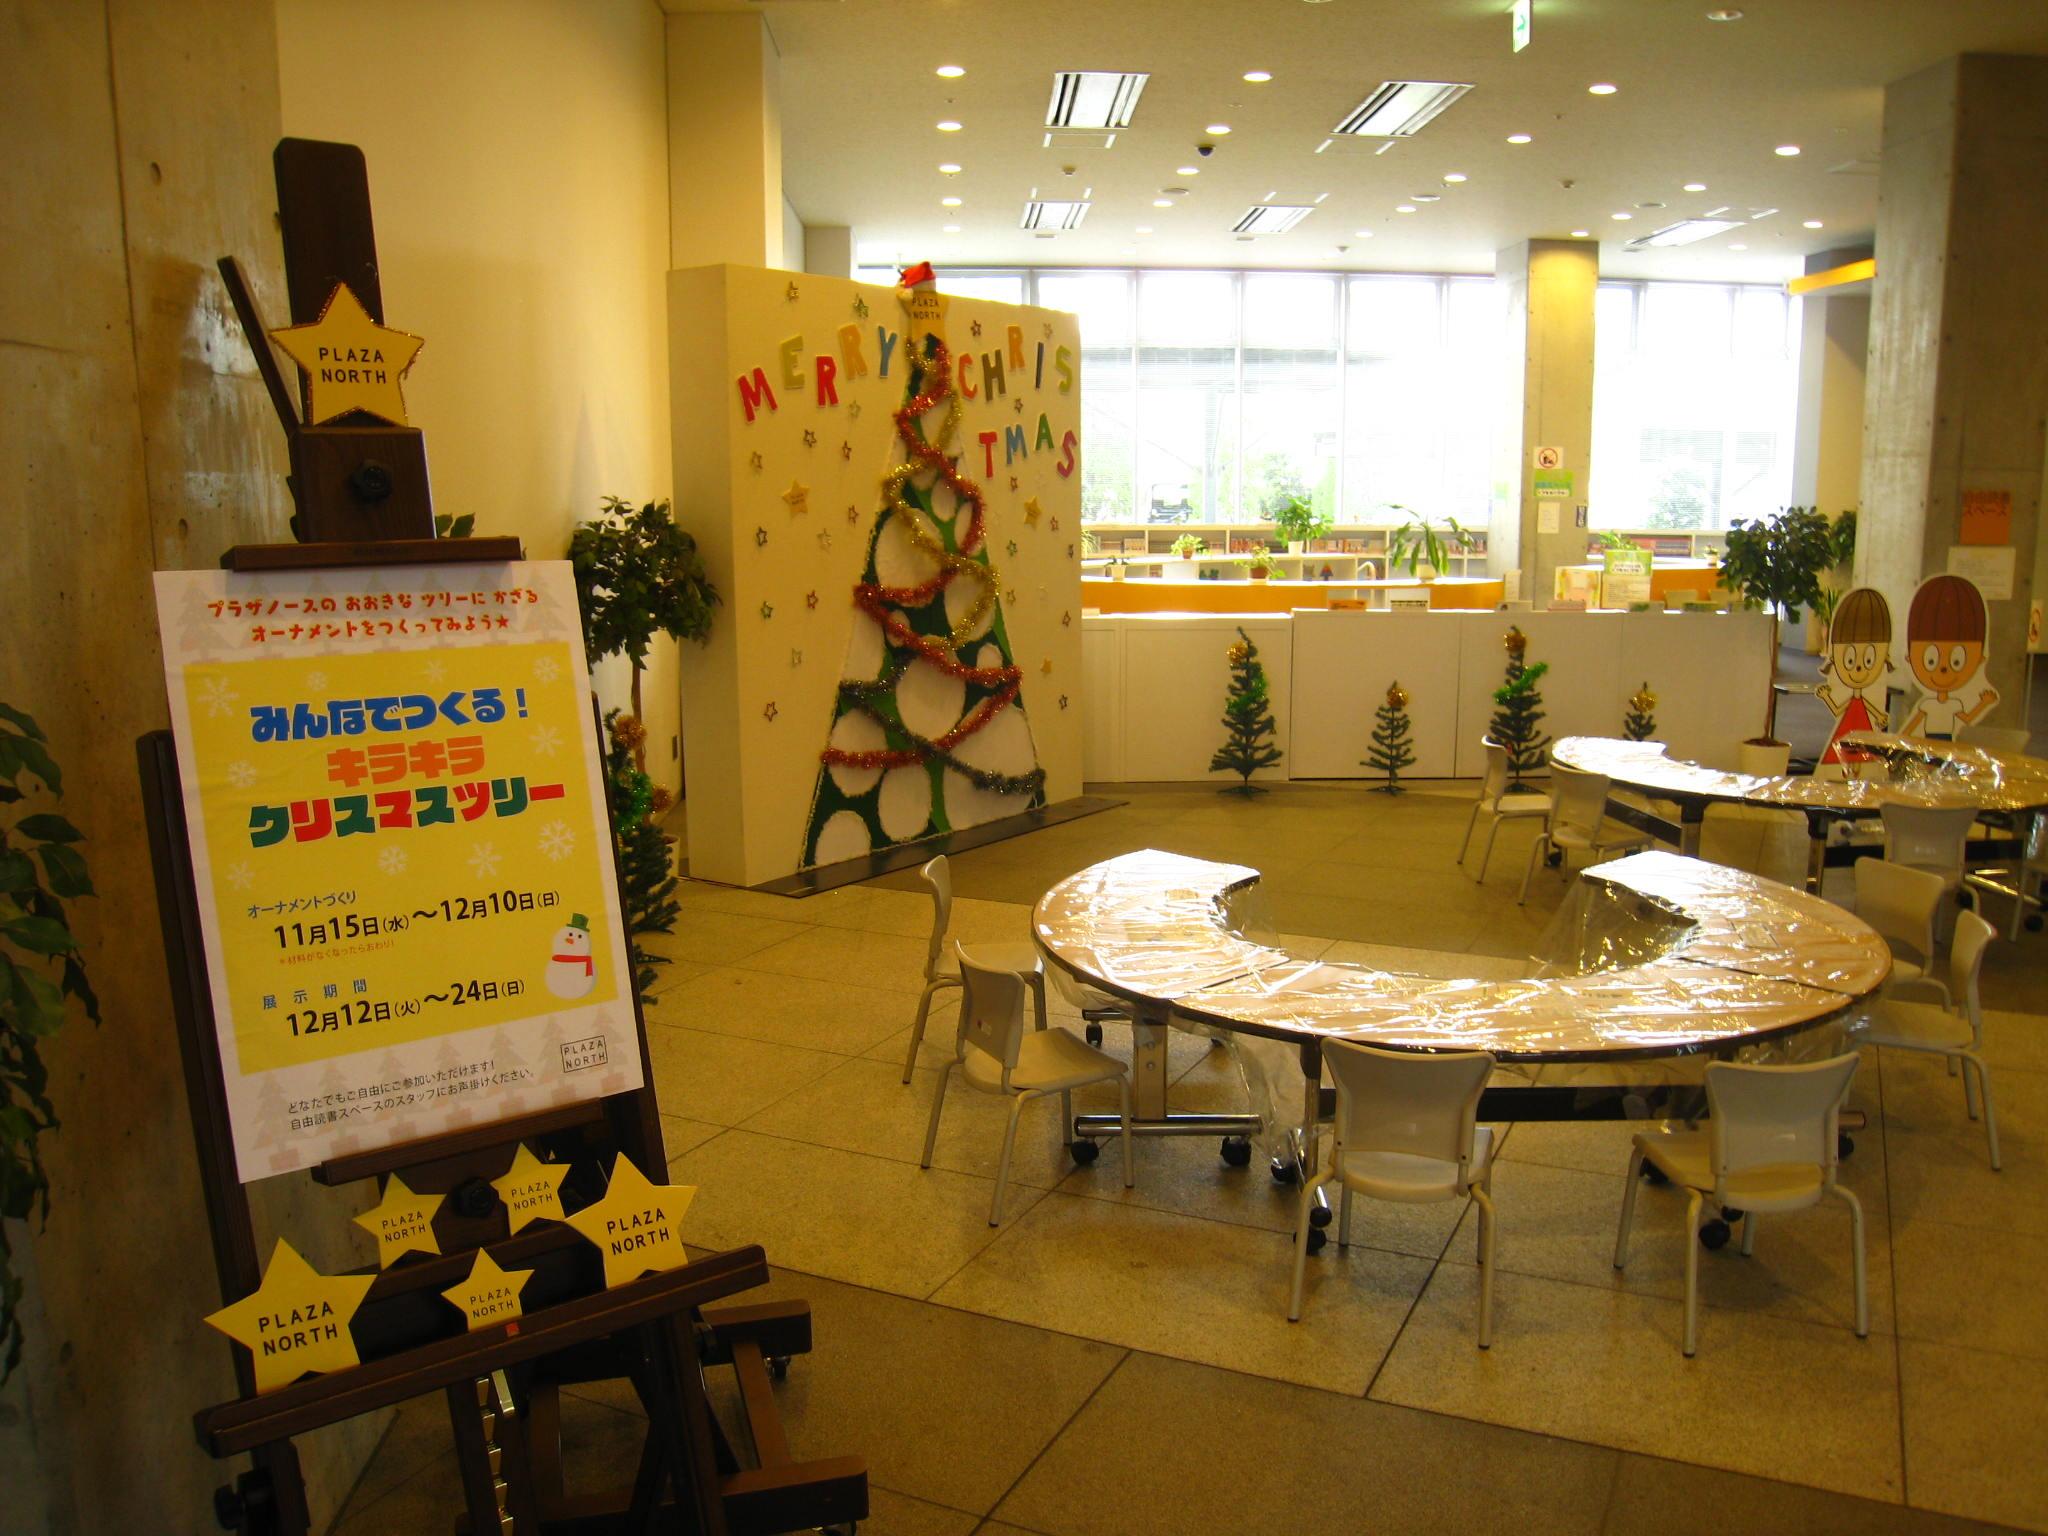 http://www.plazanorth.jp/humorsquare/171114%EF%BC%BFIMG_4812.JPG